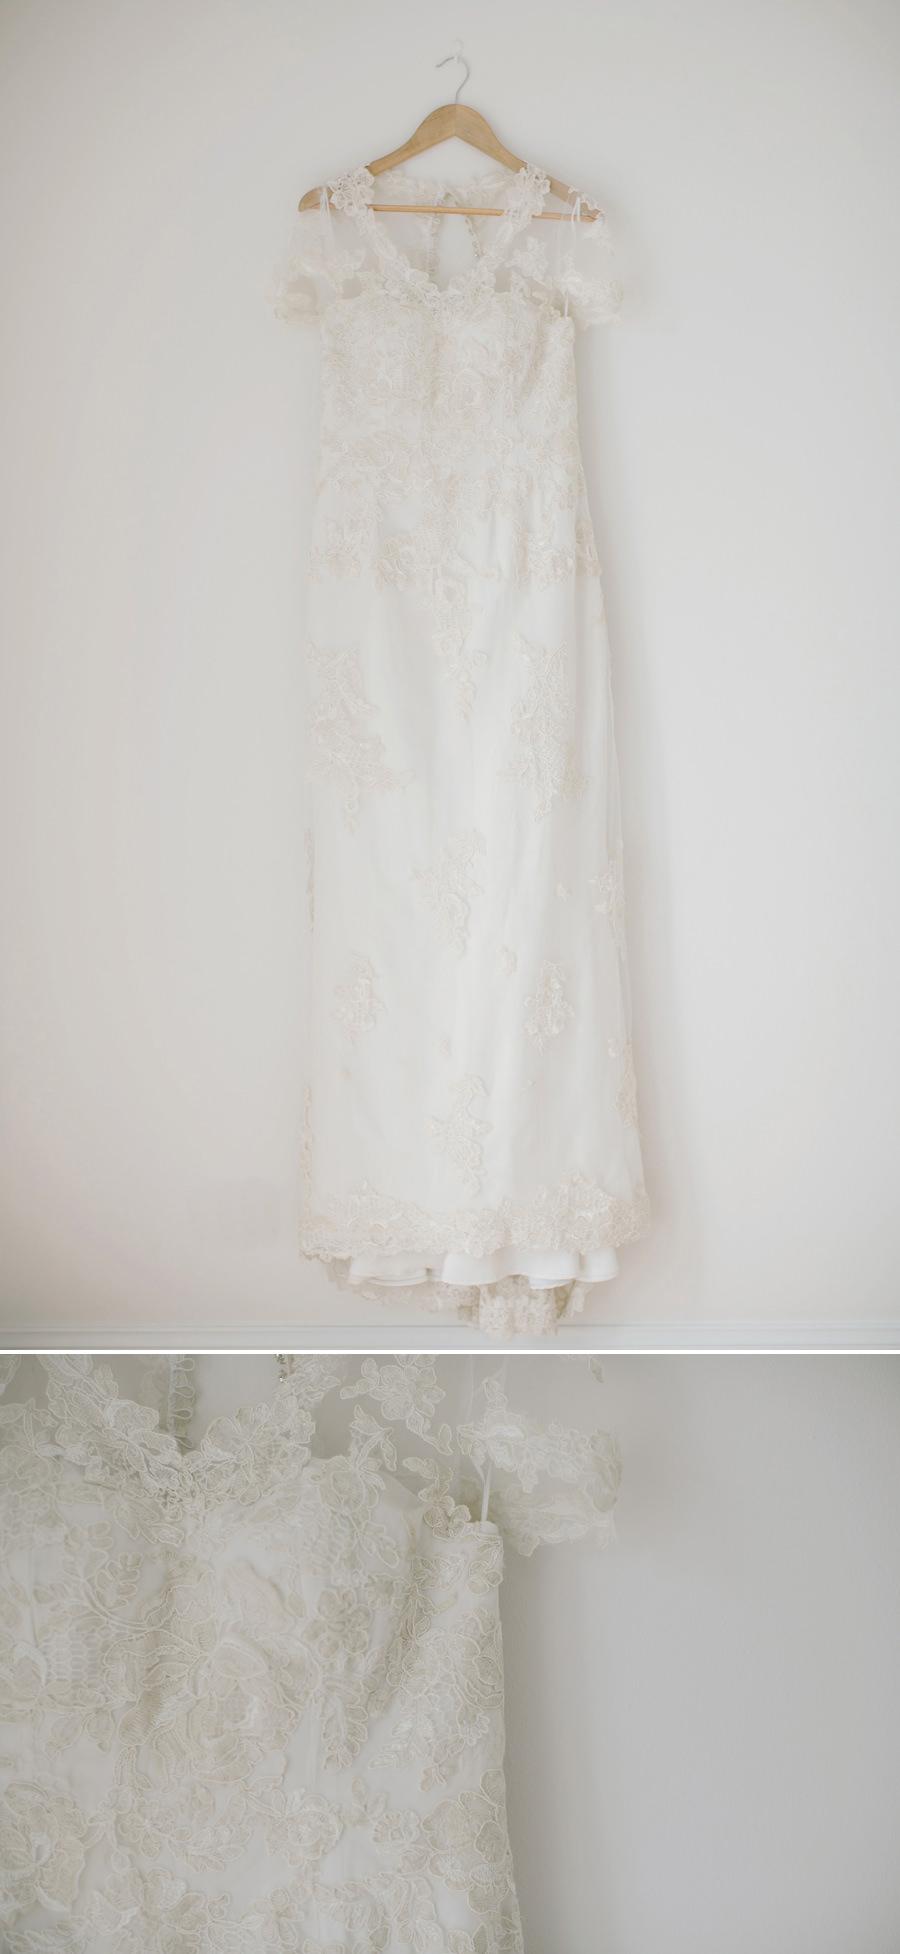 Mandy Heng Wedding Photographer: Brides dress